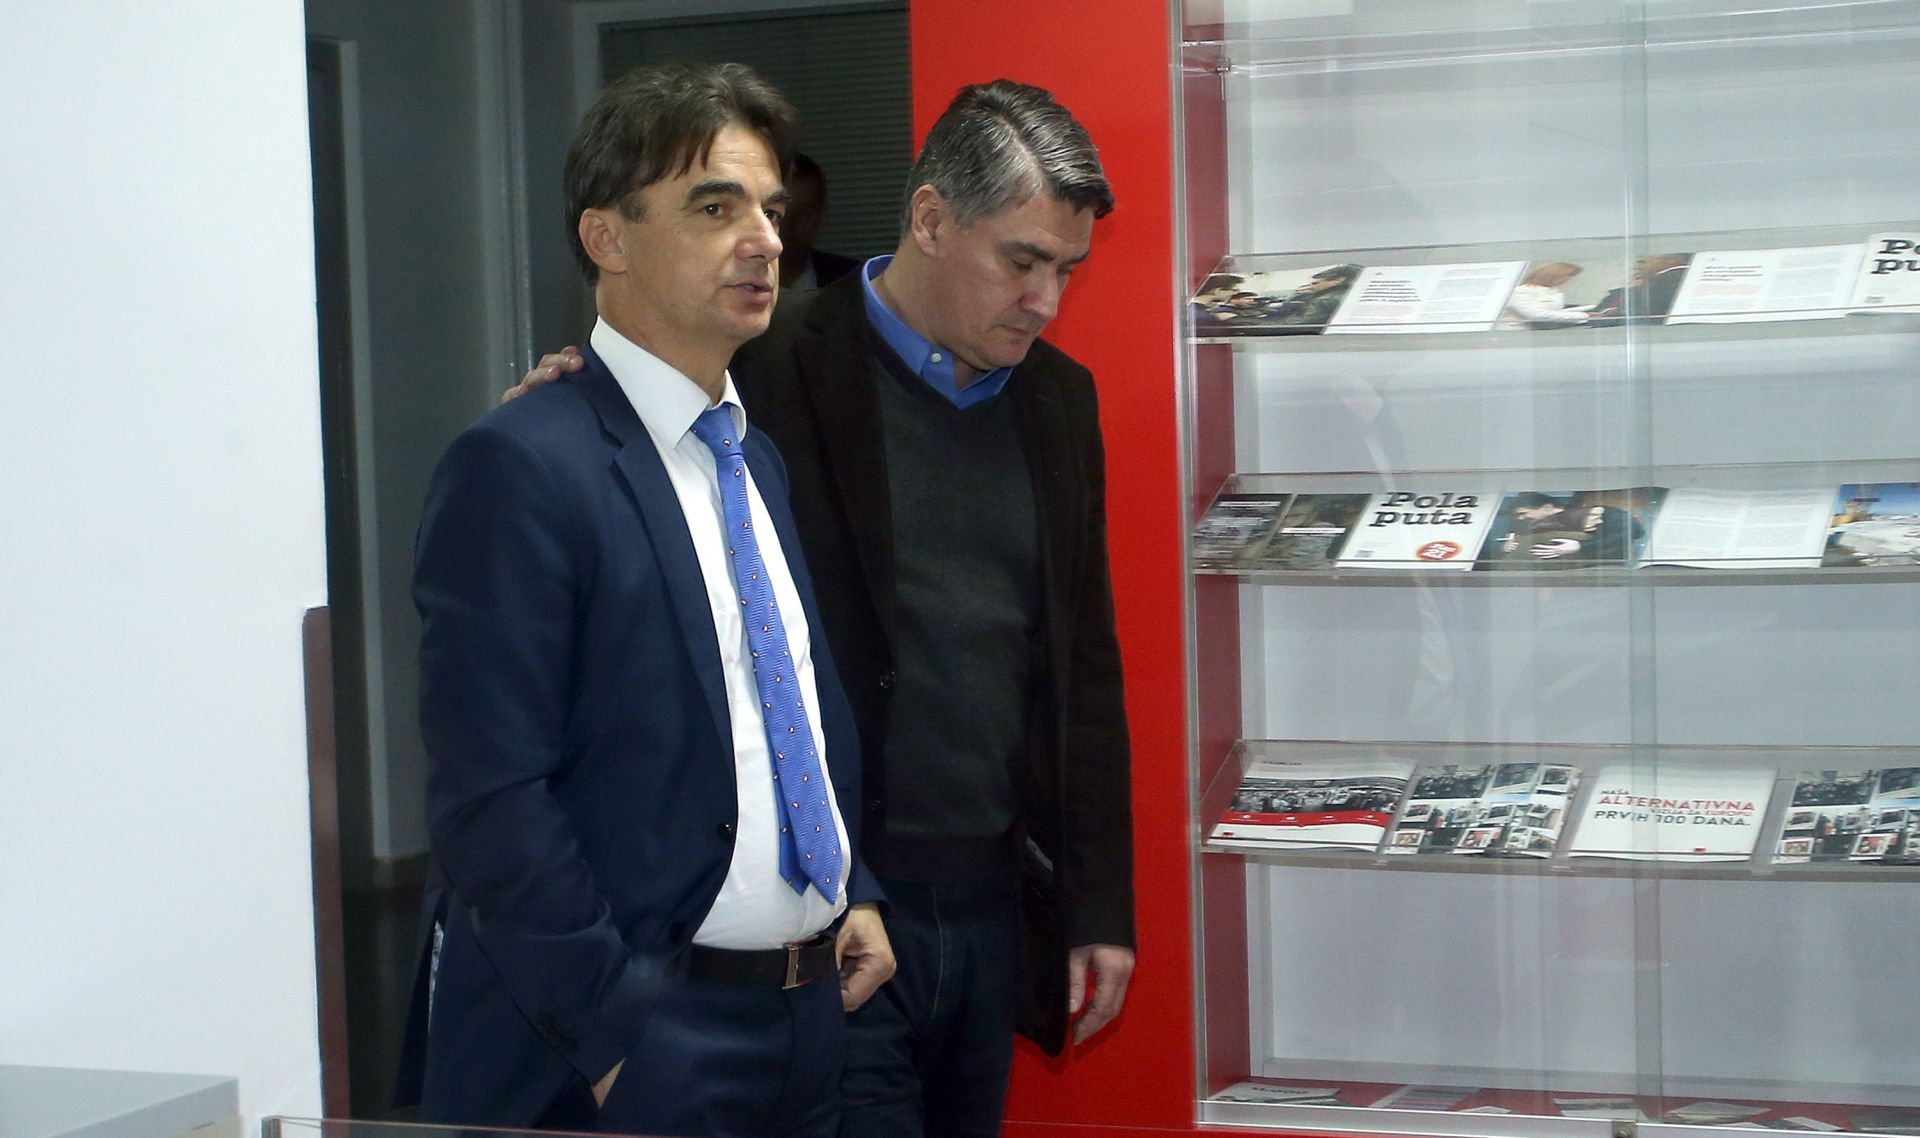 Zastupnici SDP-a predložili Milanovića za mandatara